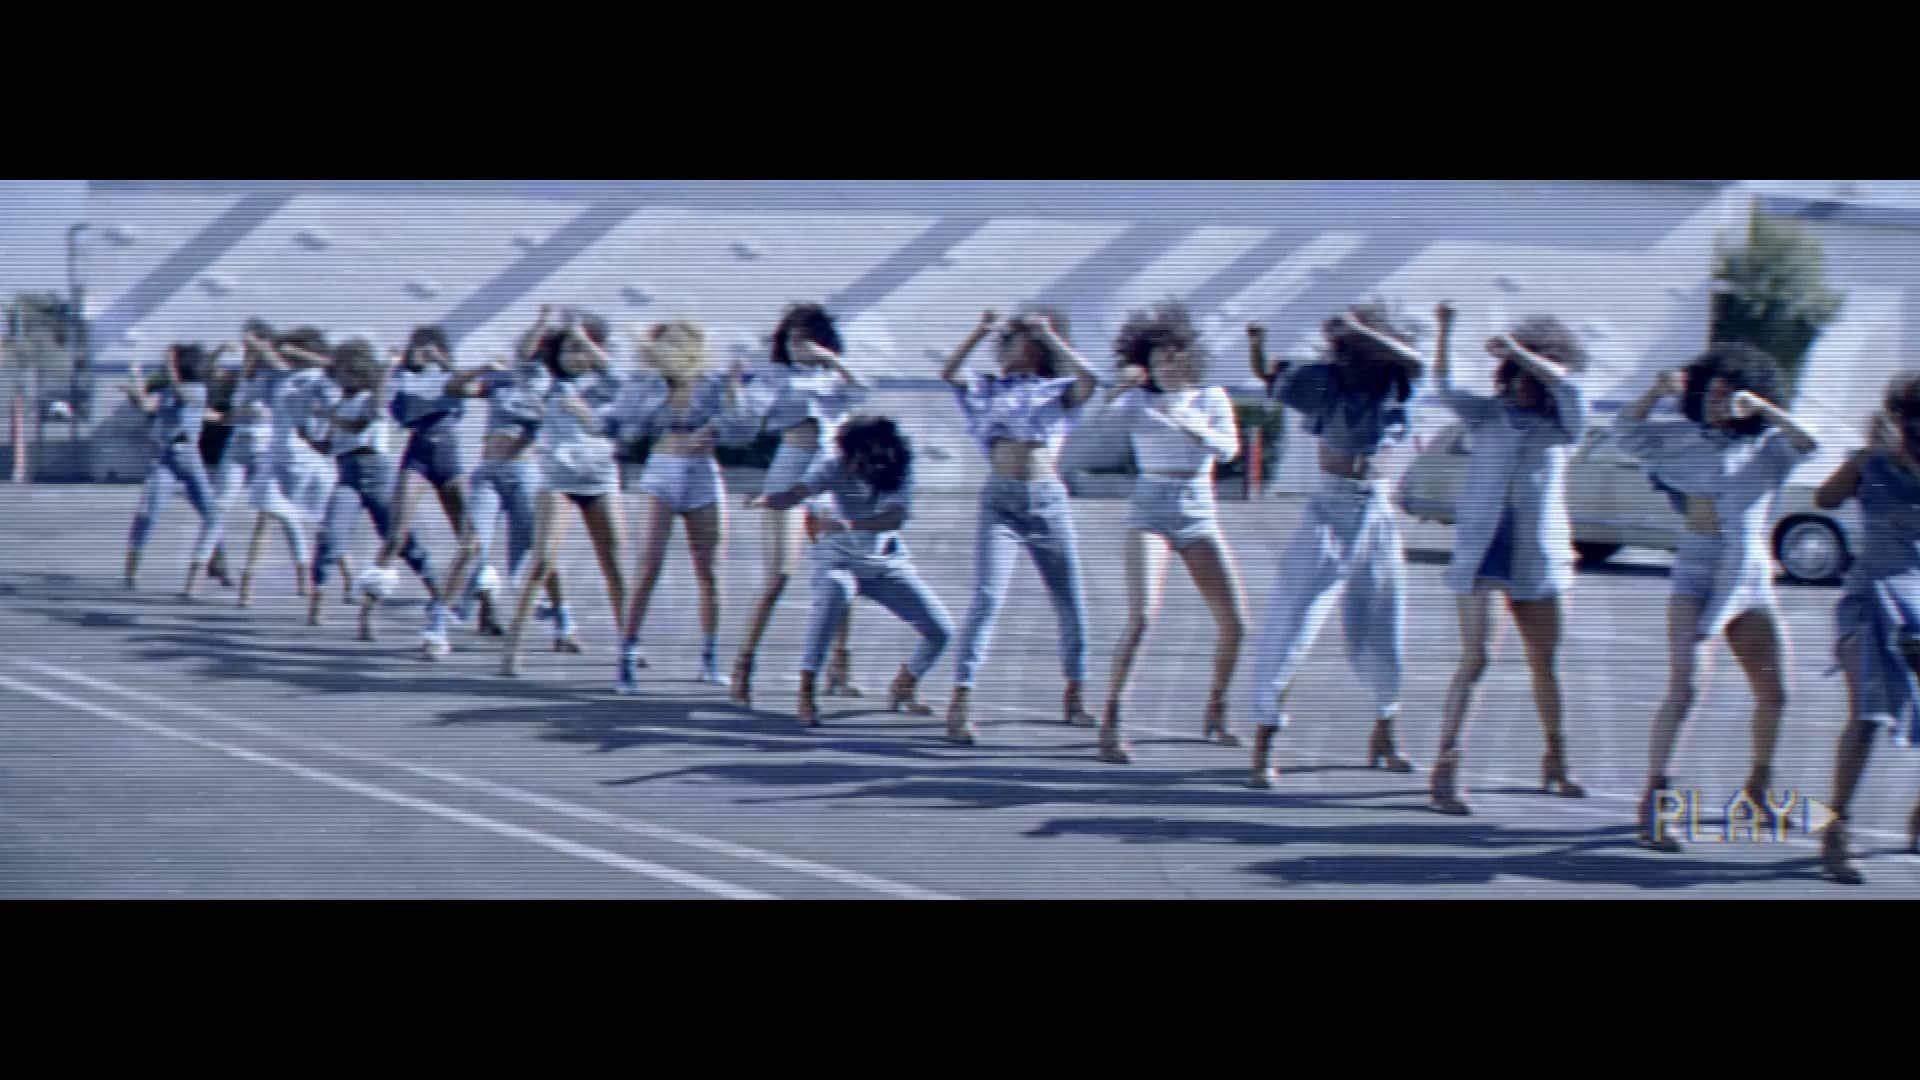 Beyoncé - Formation on Vimeo